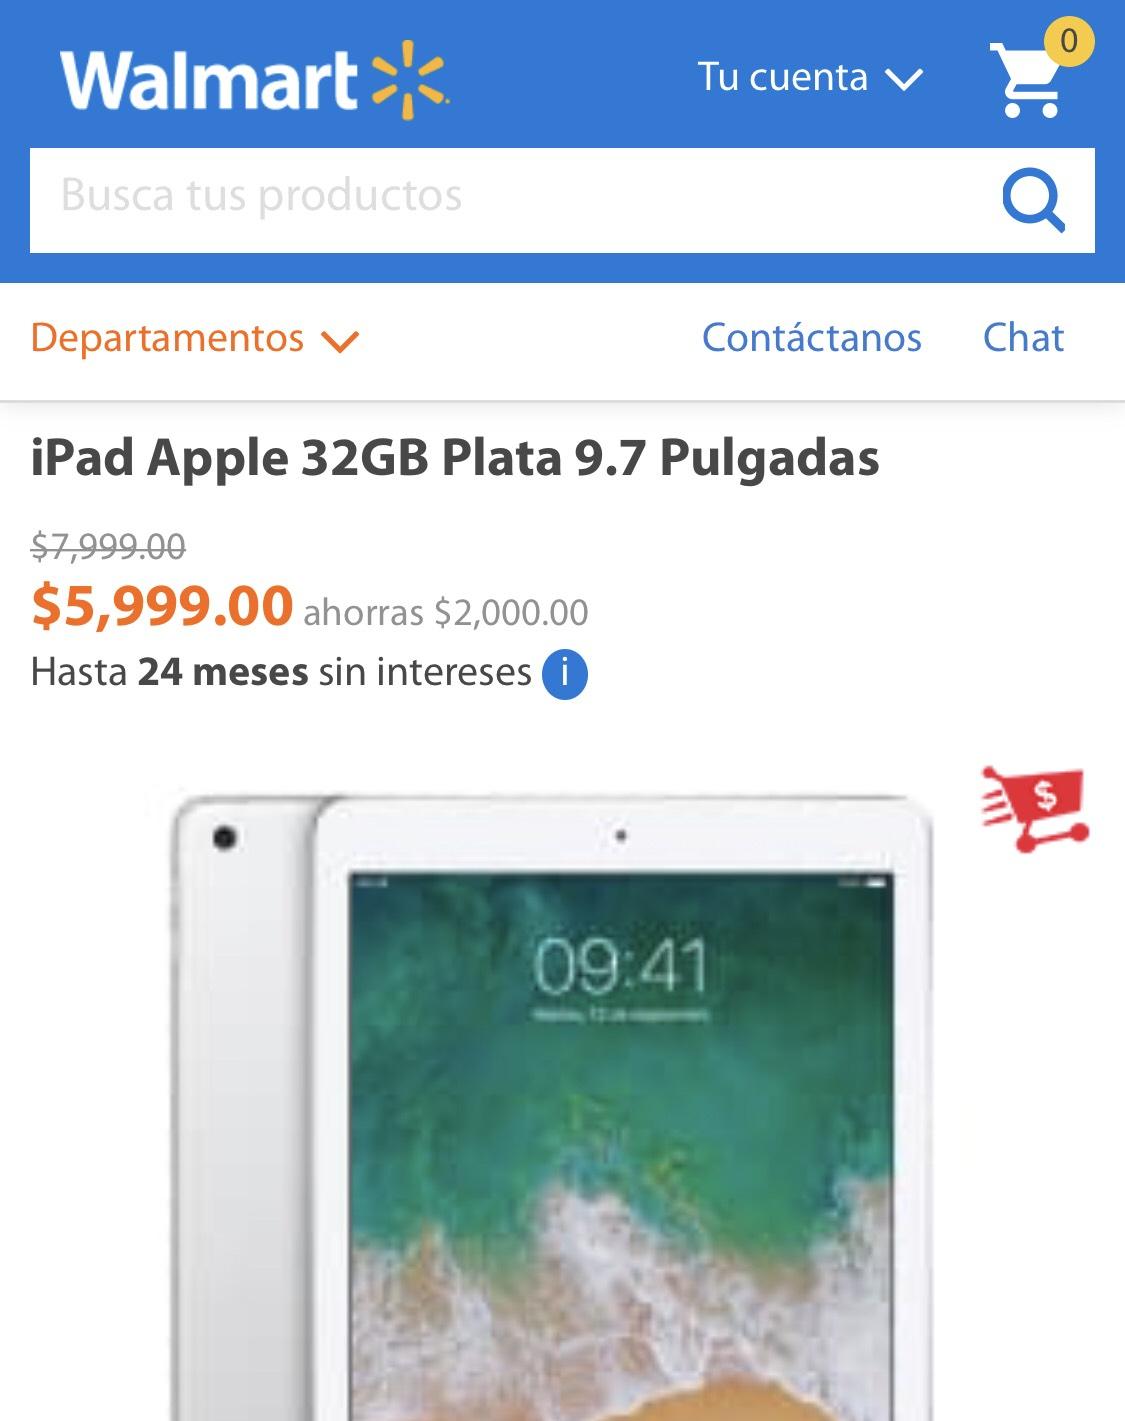 Walmart: iPad Apple 32GB Plata 9.7 Pulgadas. Hasta 18 y 24 meses sin intereses!!